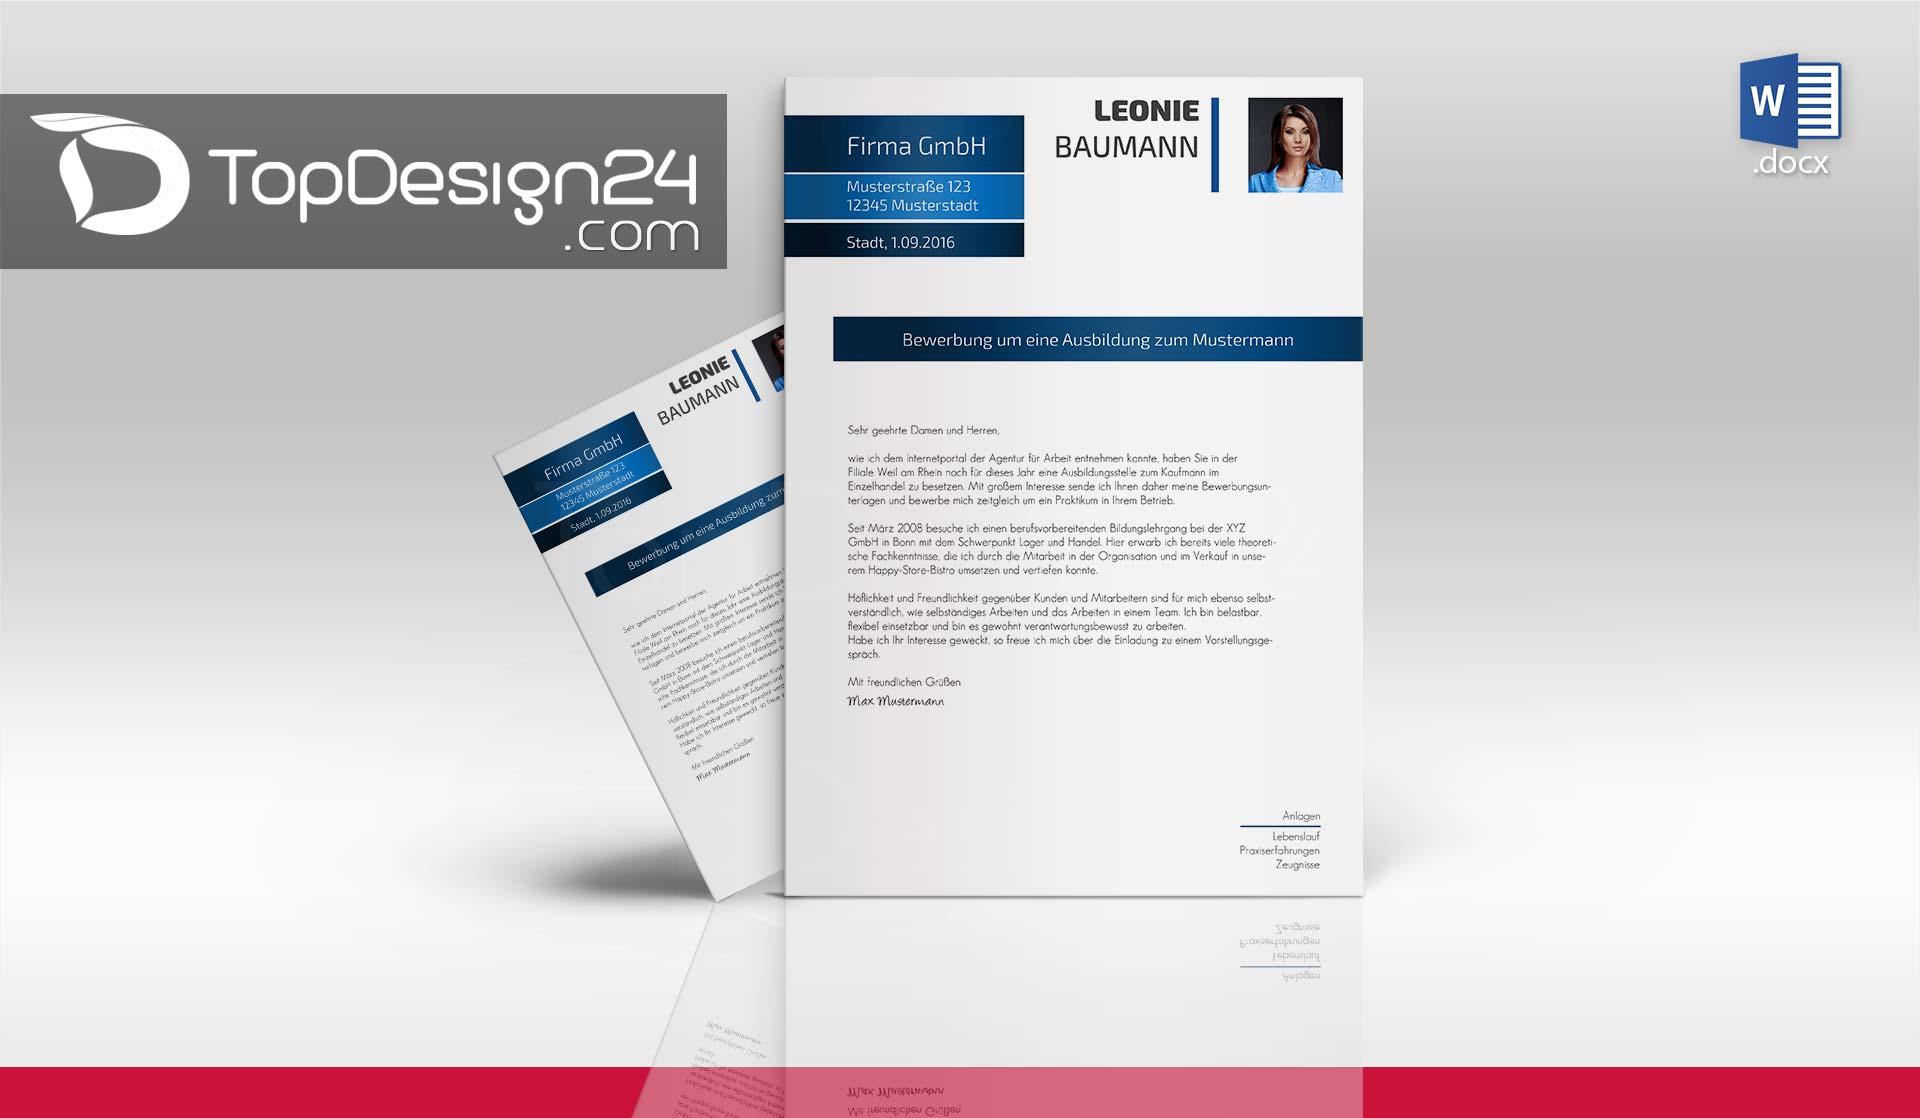 Bewerbung design word topdesign24 bewerbungsvorlagen Create a blueprint